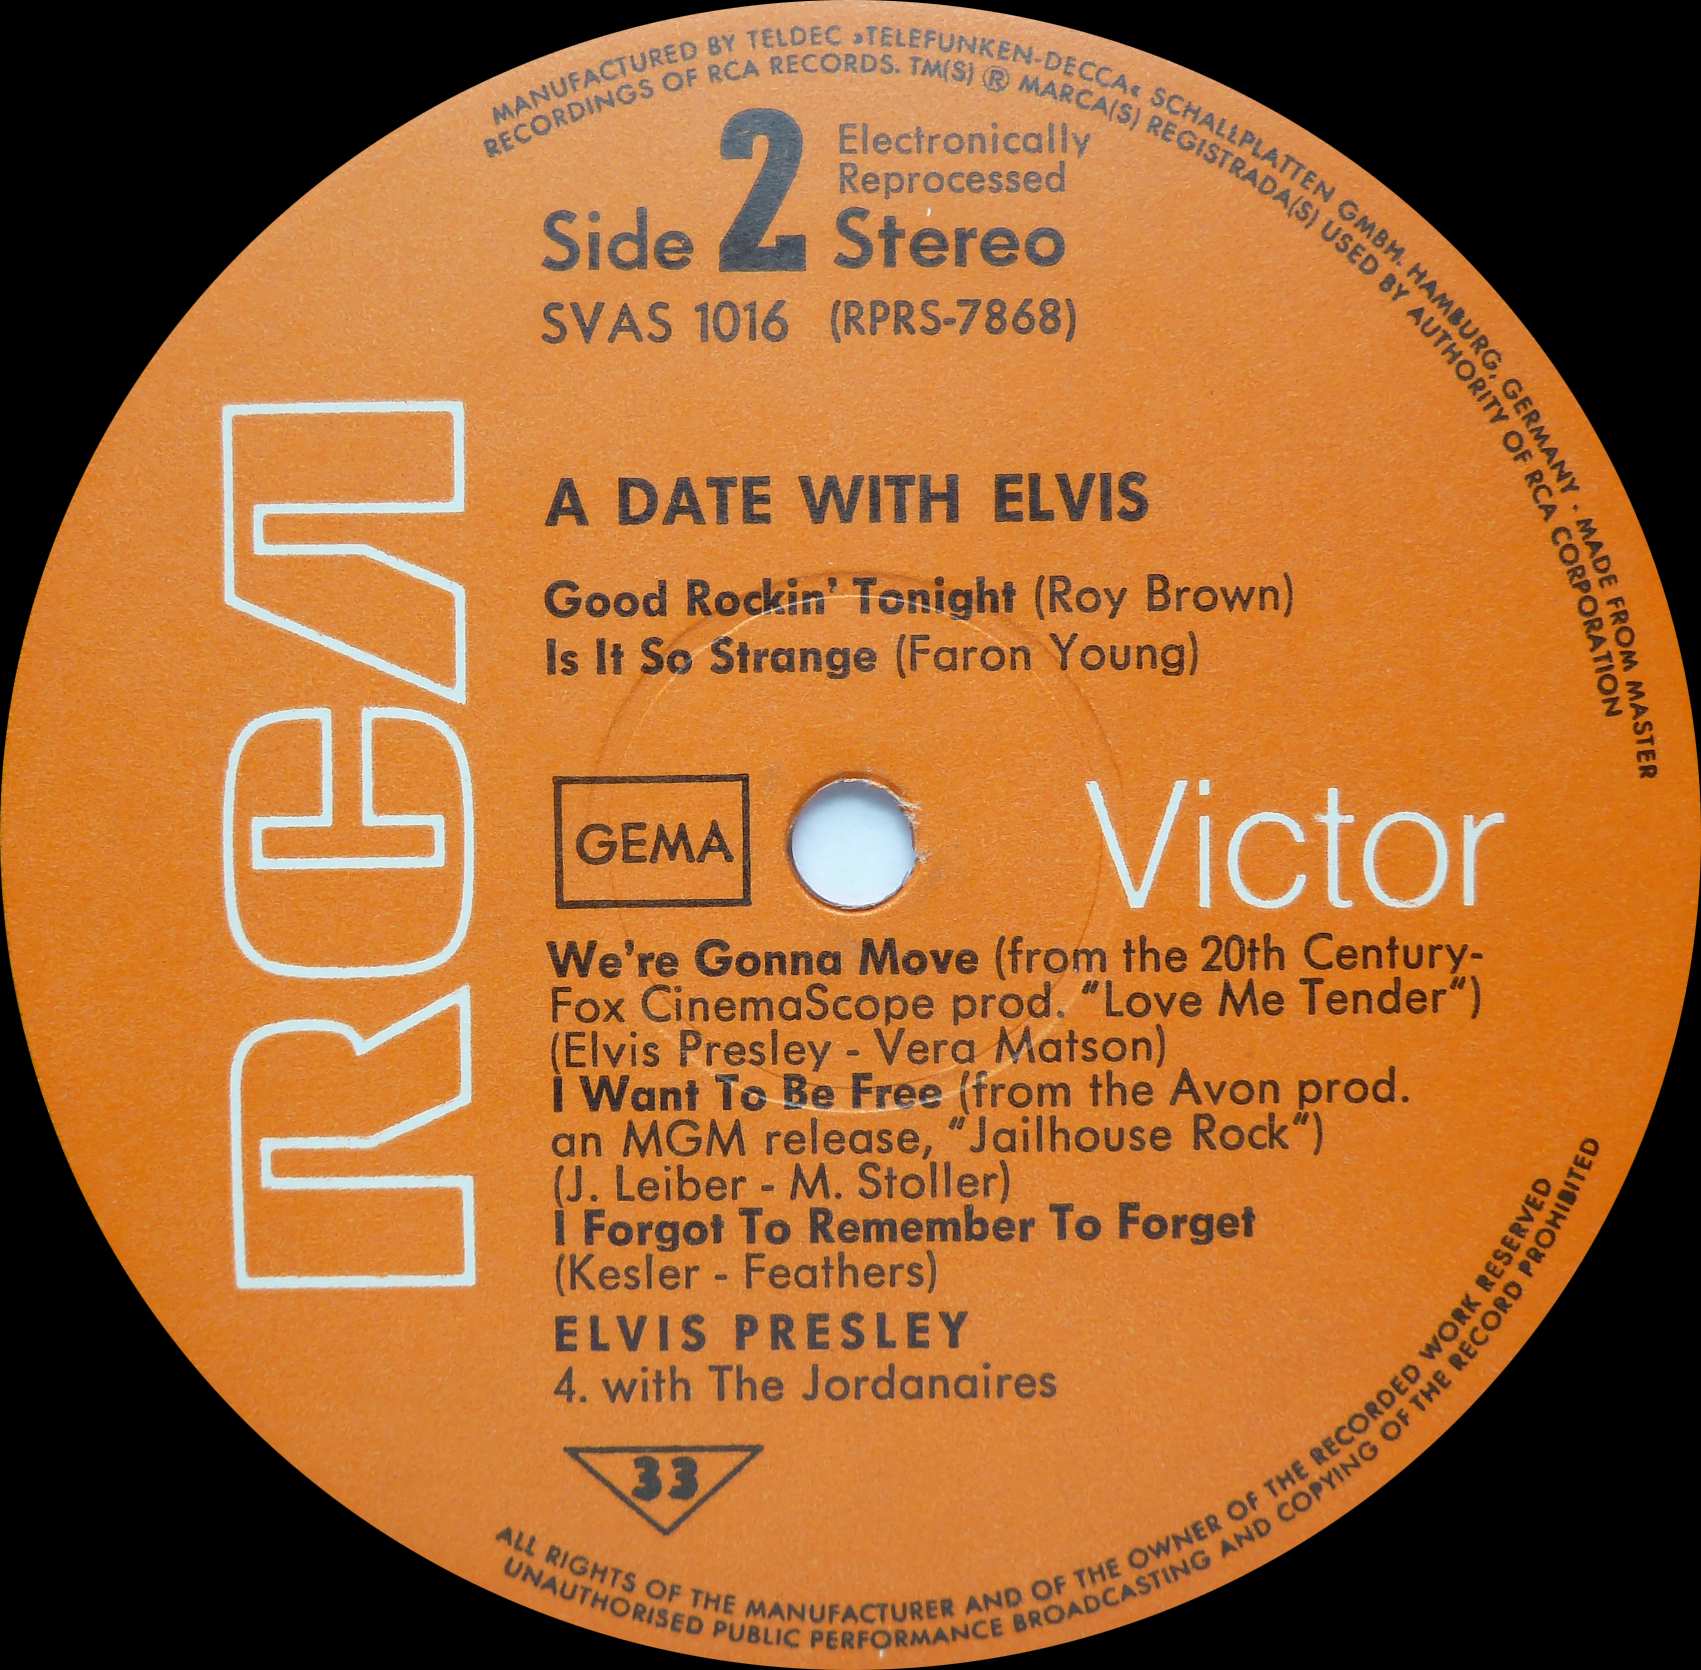 A DATE WITH ELVIS Adate70side2jfu8z